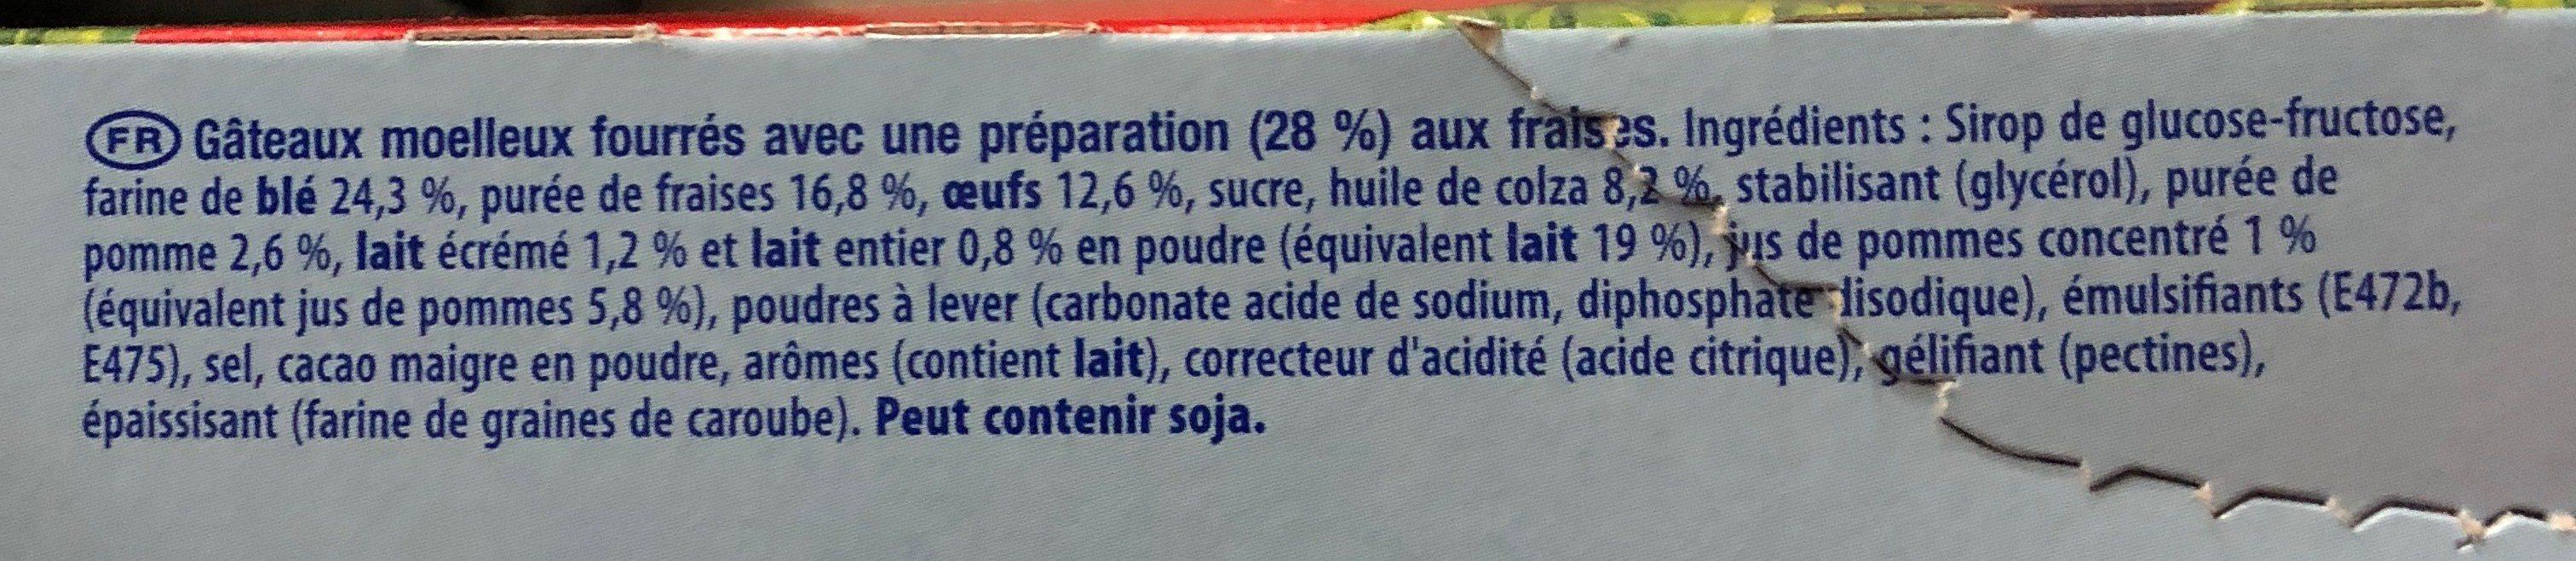 Lulu l'ourson fraise - Ingredients